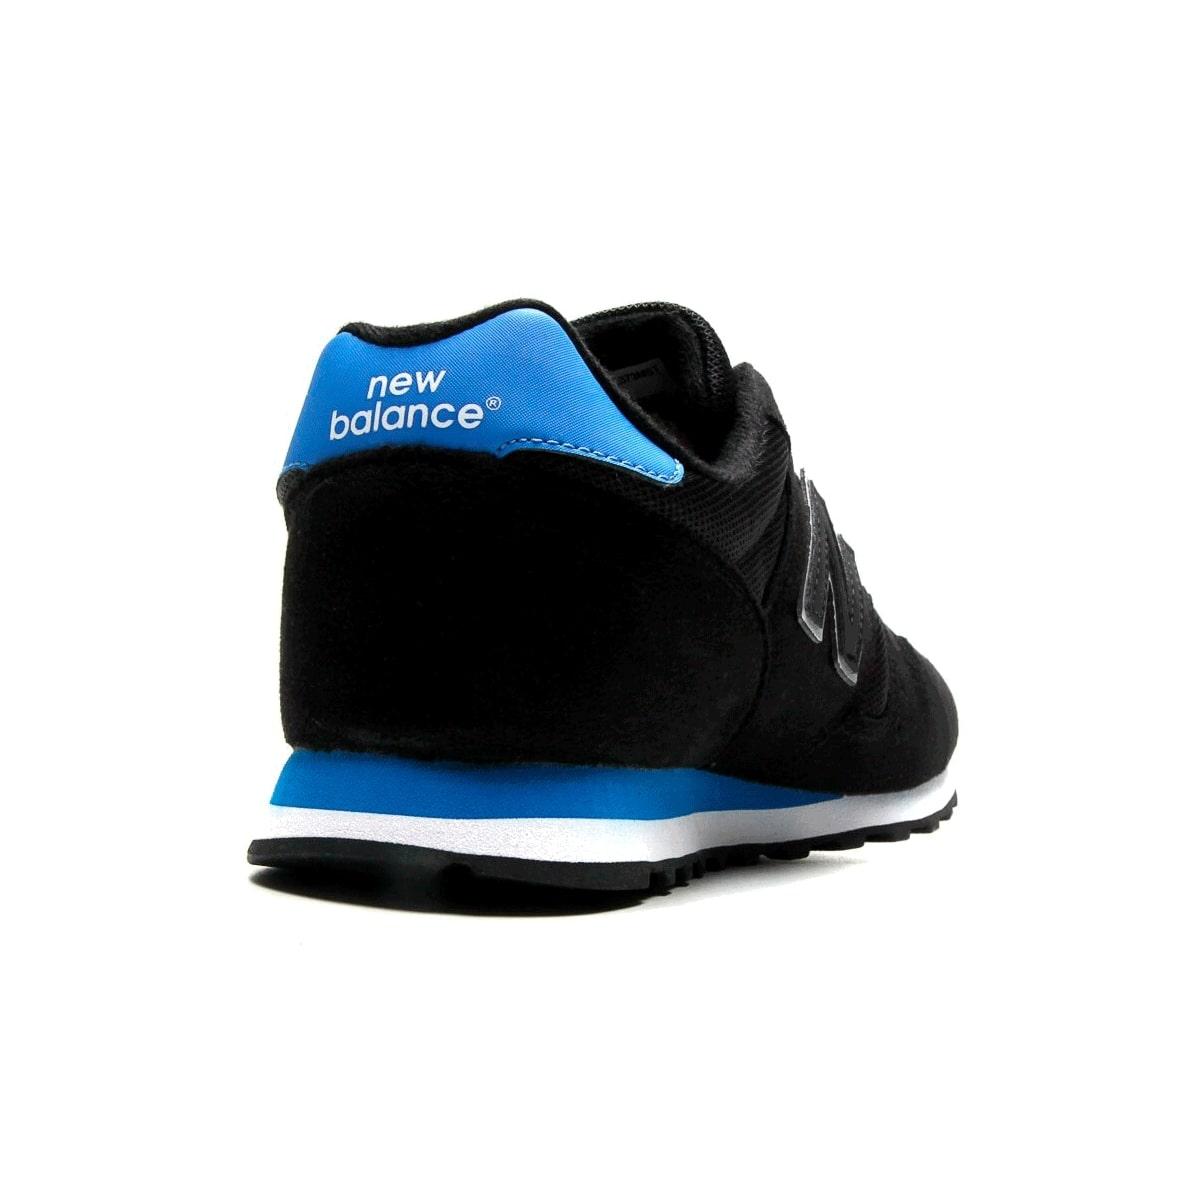 Tênis New Balance 373 Masculino Preto Azul